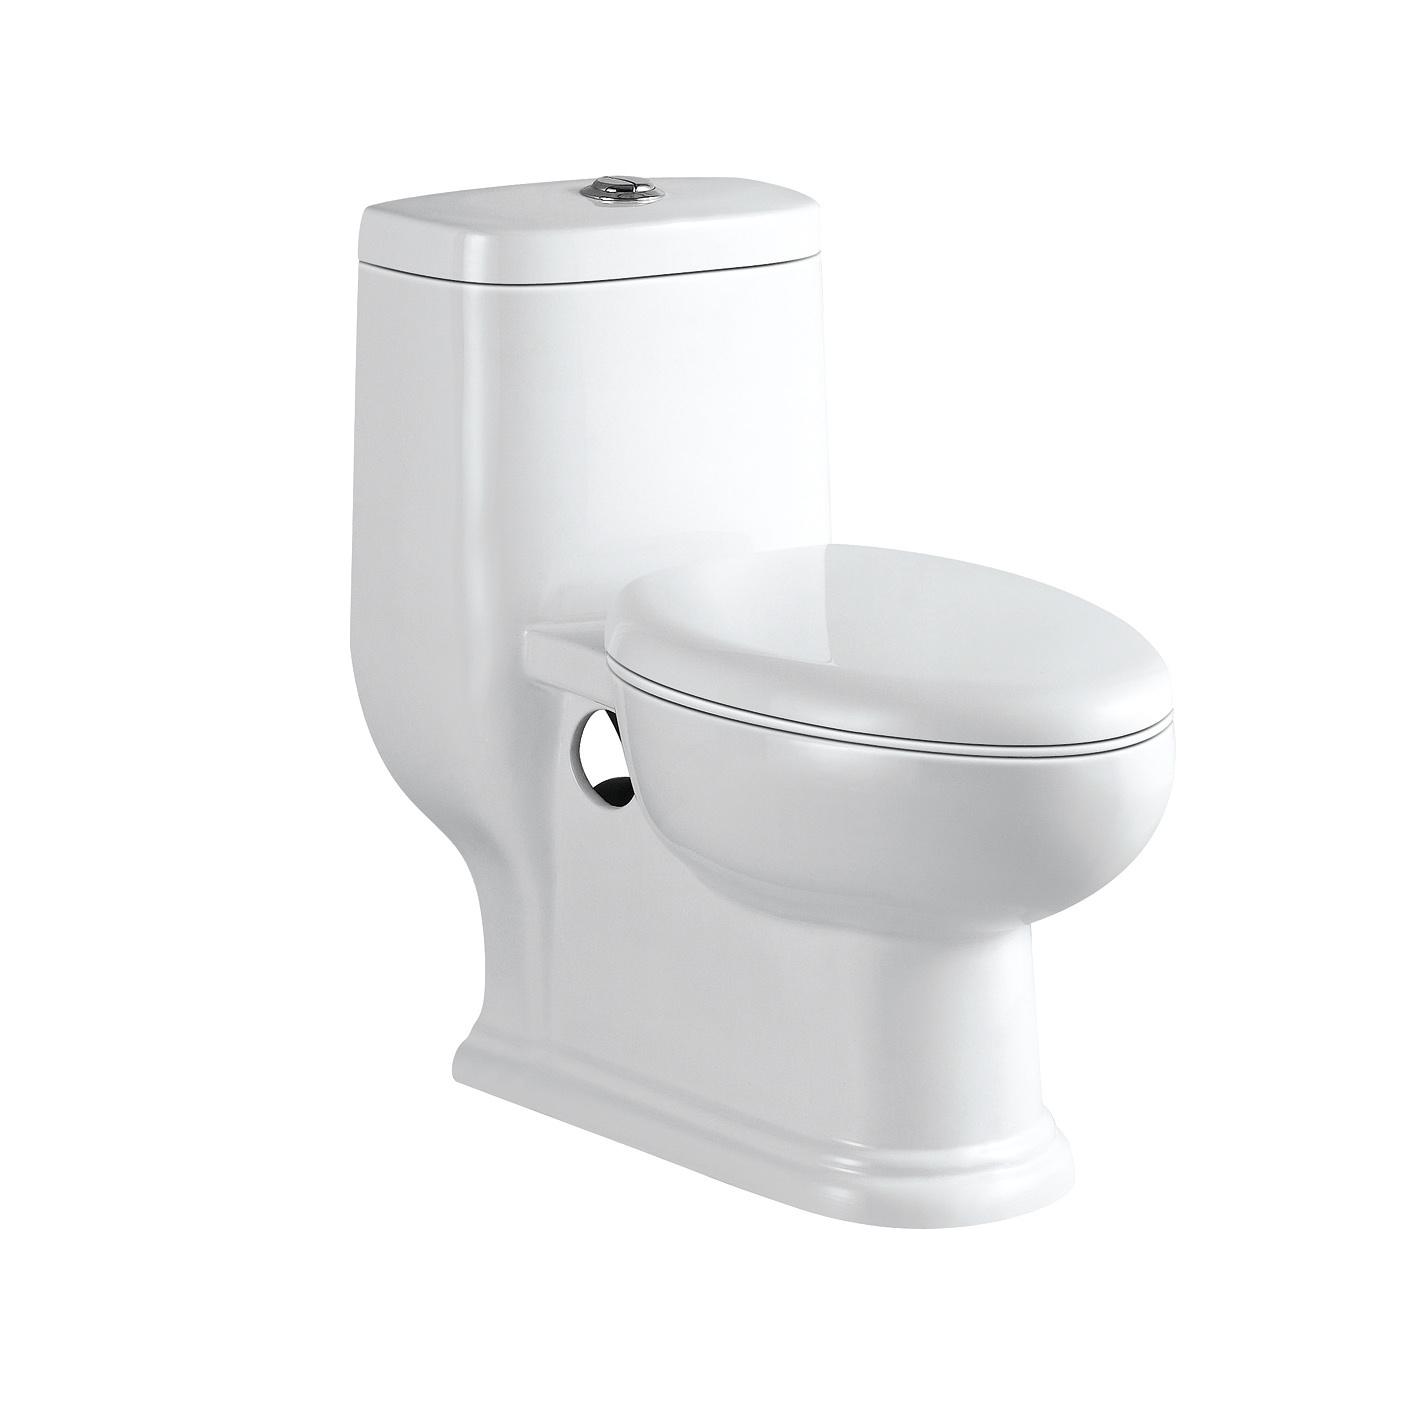 China one piece wc toilet b11004 china toilet bathroom toilet - Wc model ...